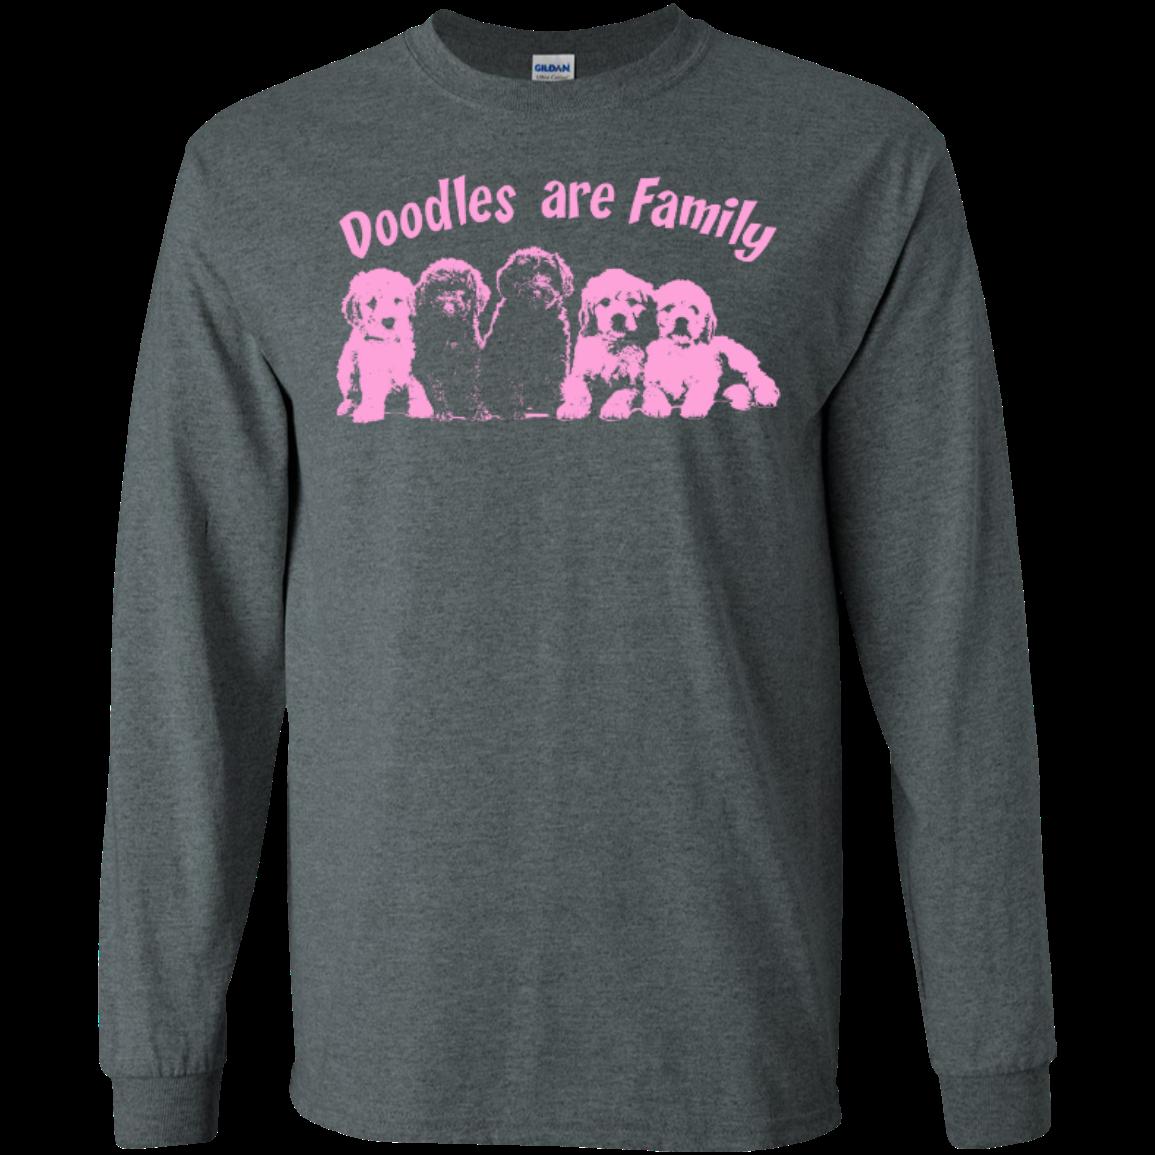 Doodles Are Family - Gildan Long Sleeve T-Shirt